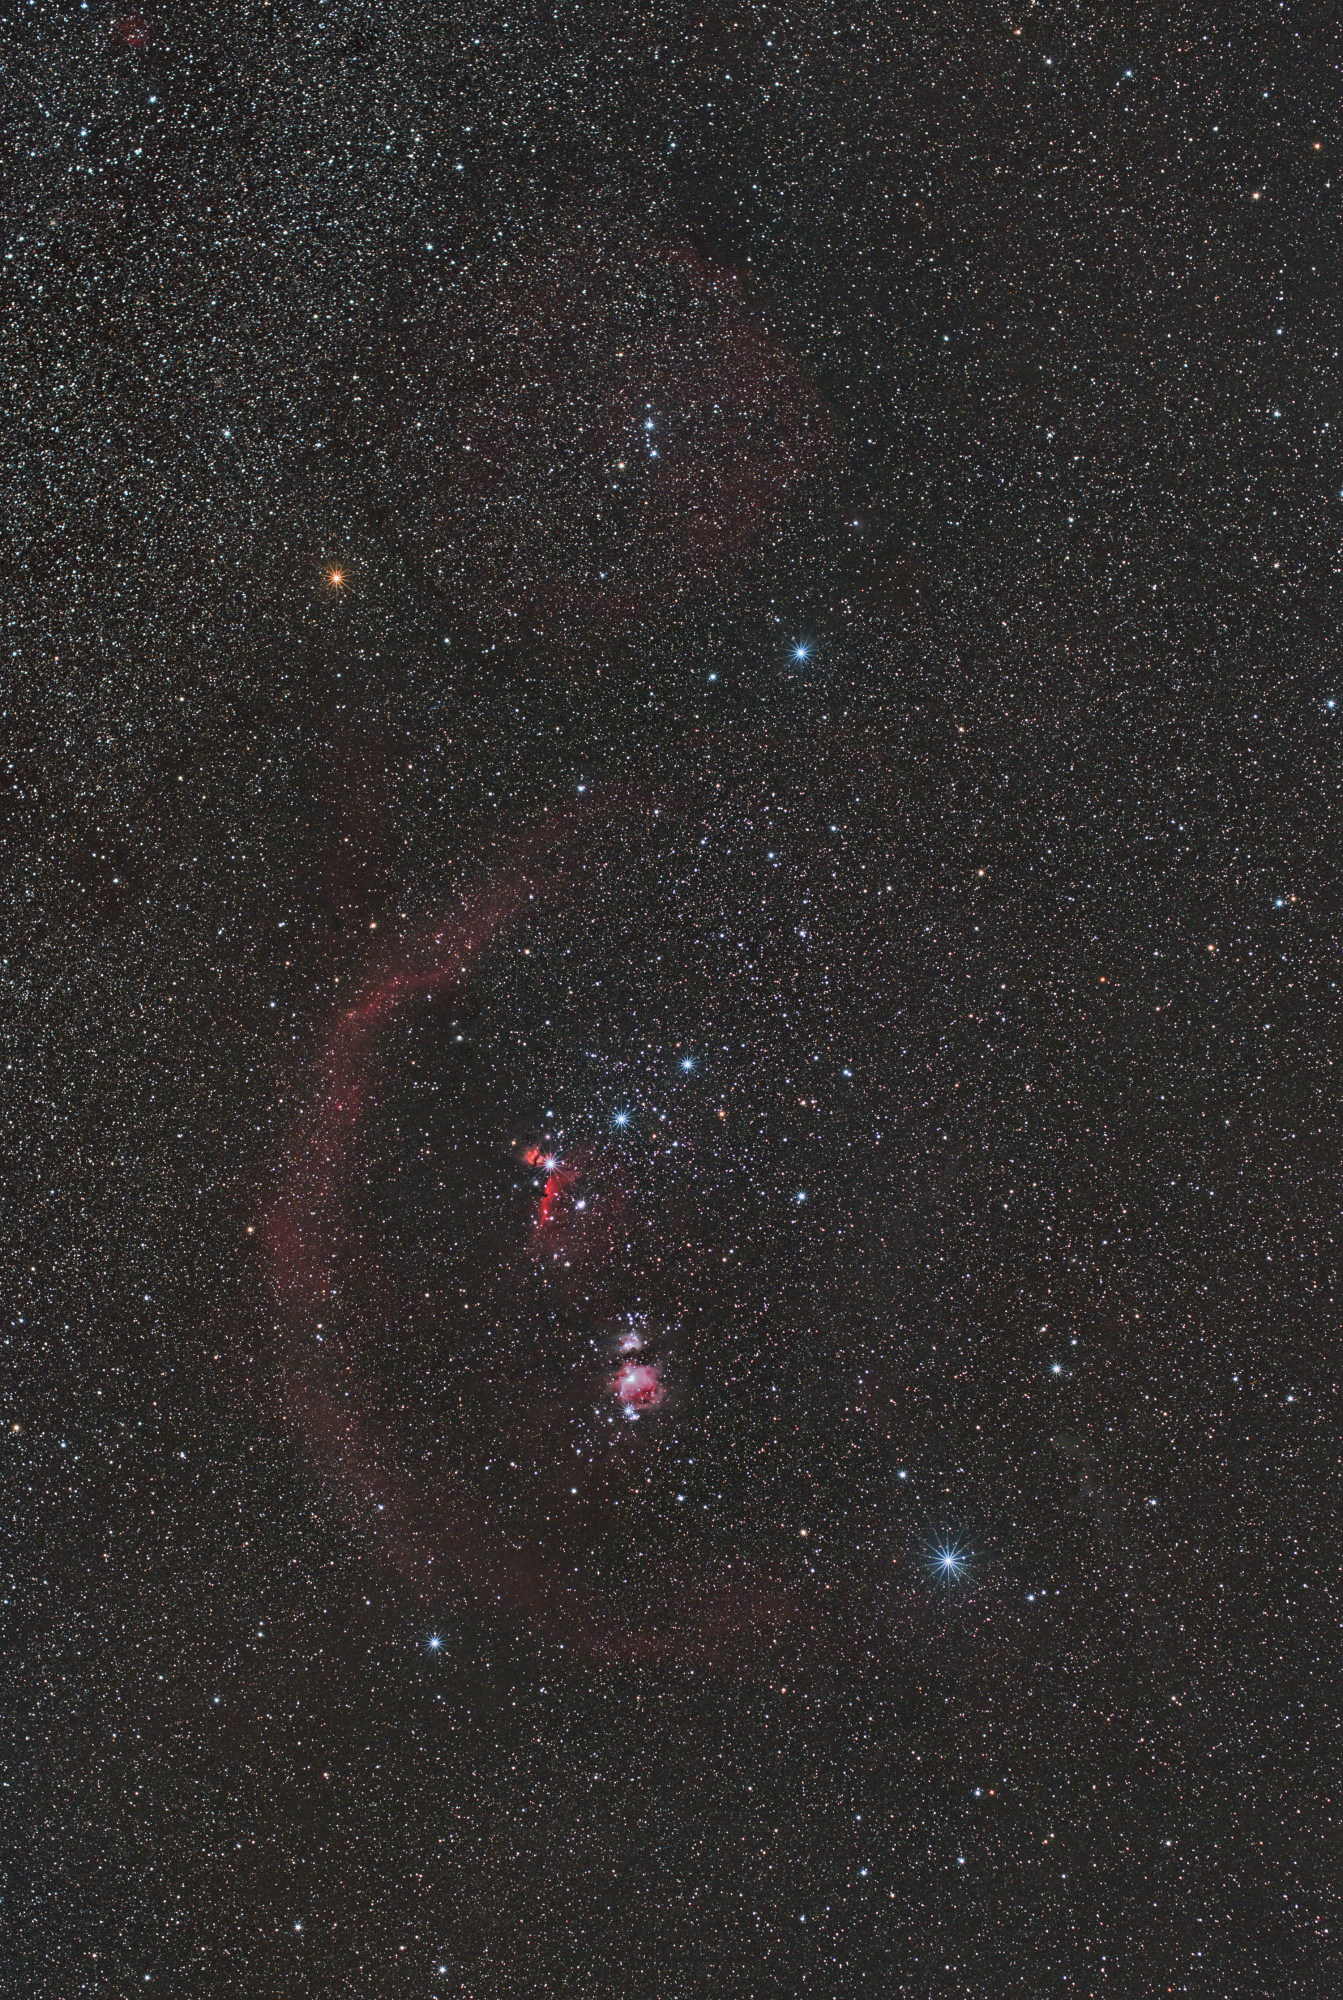 Orion 50 STC 240 x 30 a 1000 ISO 5.6 GRA 2 SB FT BD.jpg